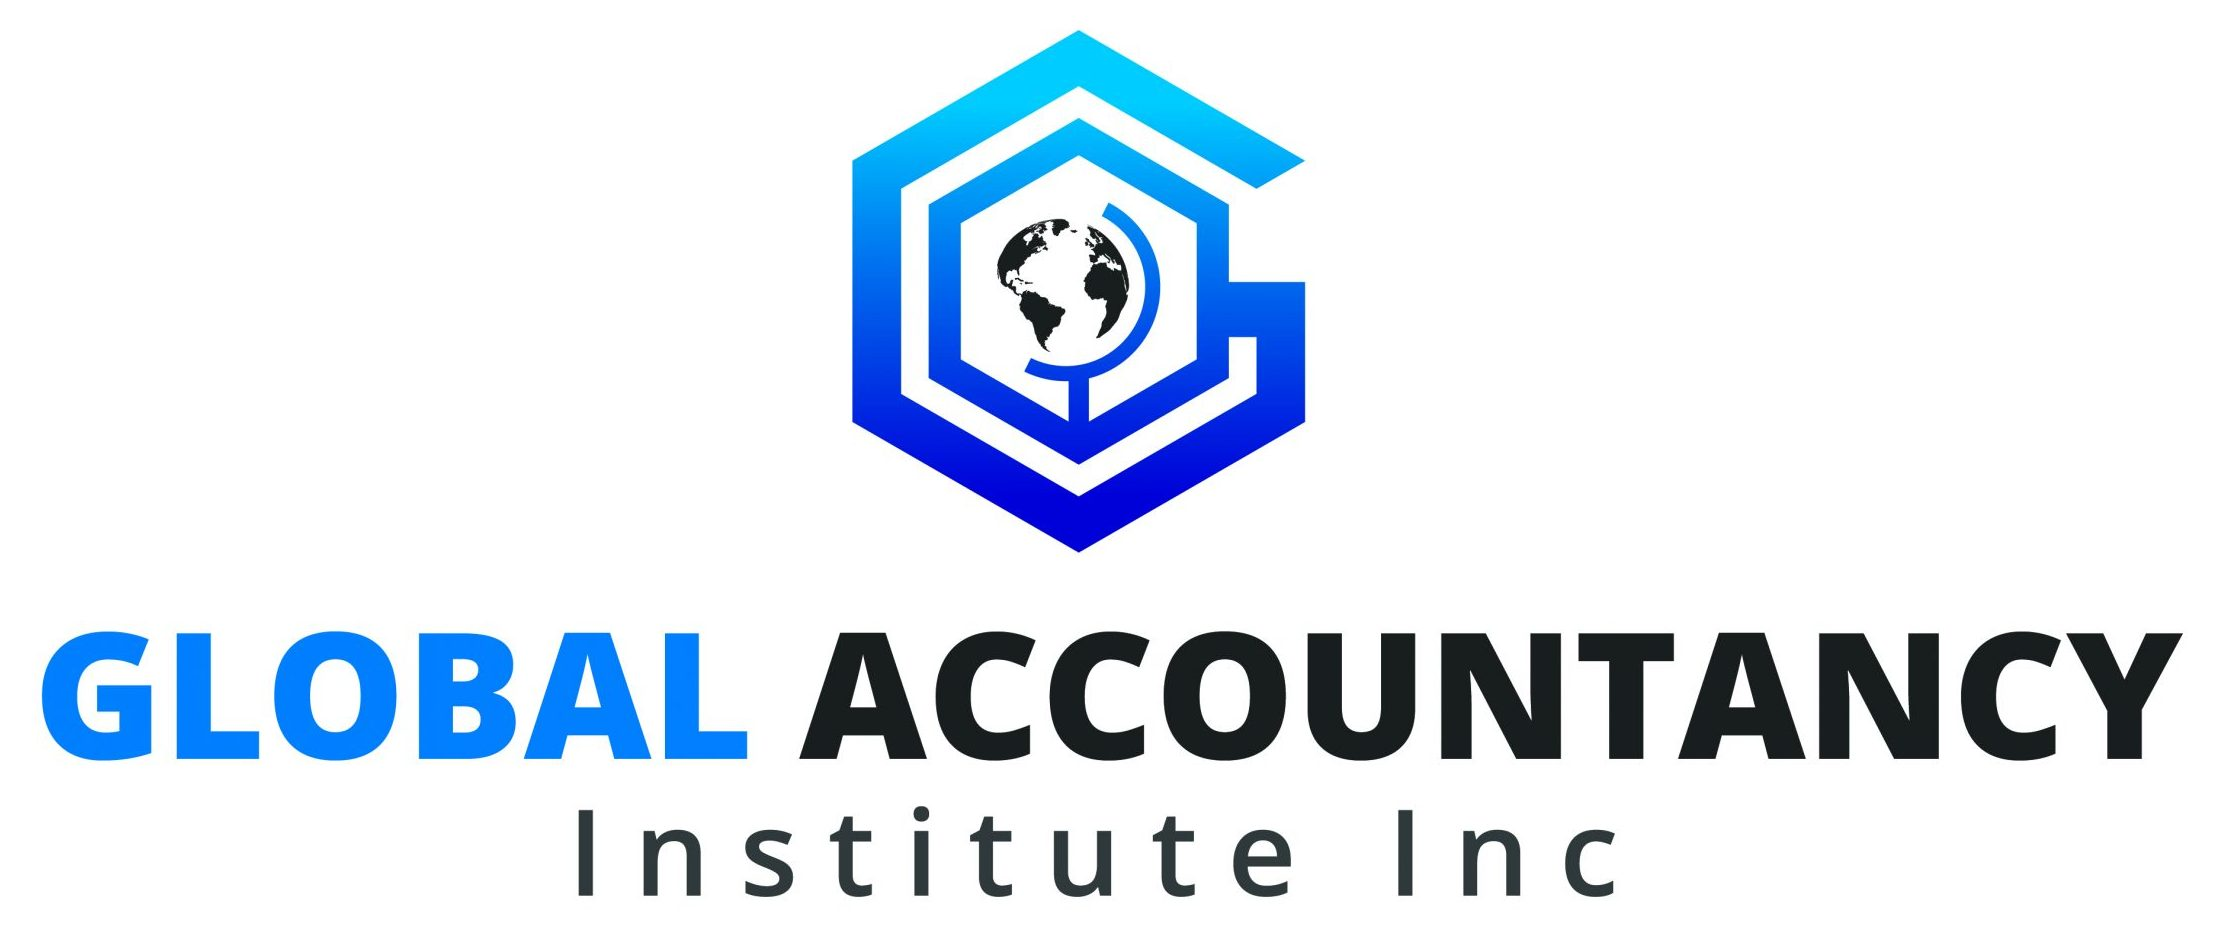 Global Accountancy Institute,Inc